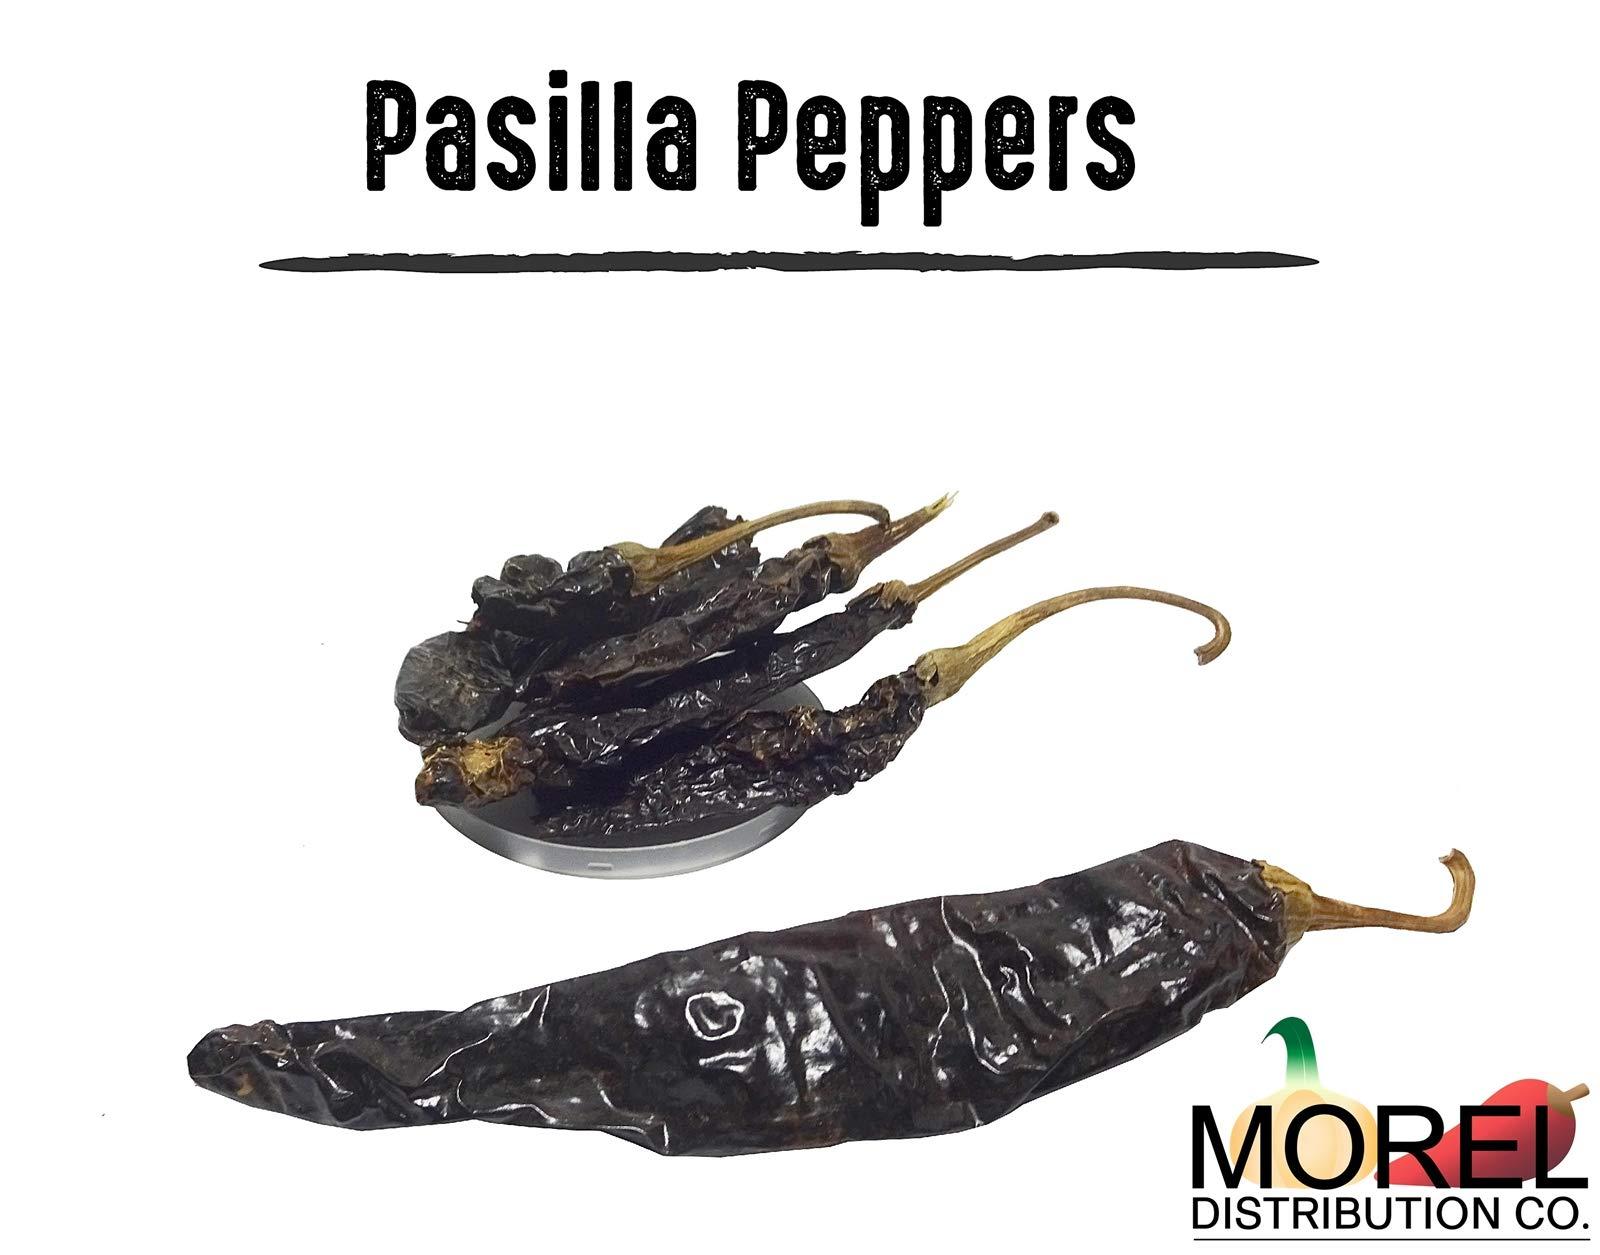 Chile Pasilla Pepper (Pasilla Negro) // Weights: 4 Oz, 8 Oz, 12 Oz, 1 Lb, 2 lbs, 5 lbs, and 10 lbs!! (2 lbs)